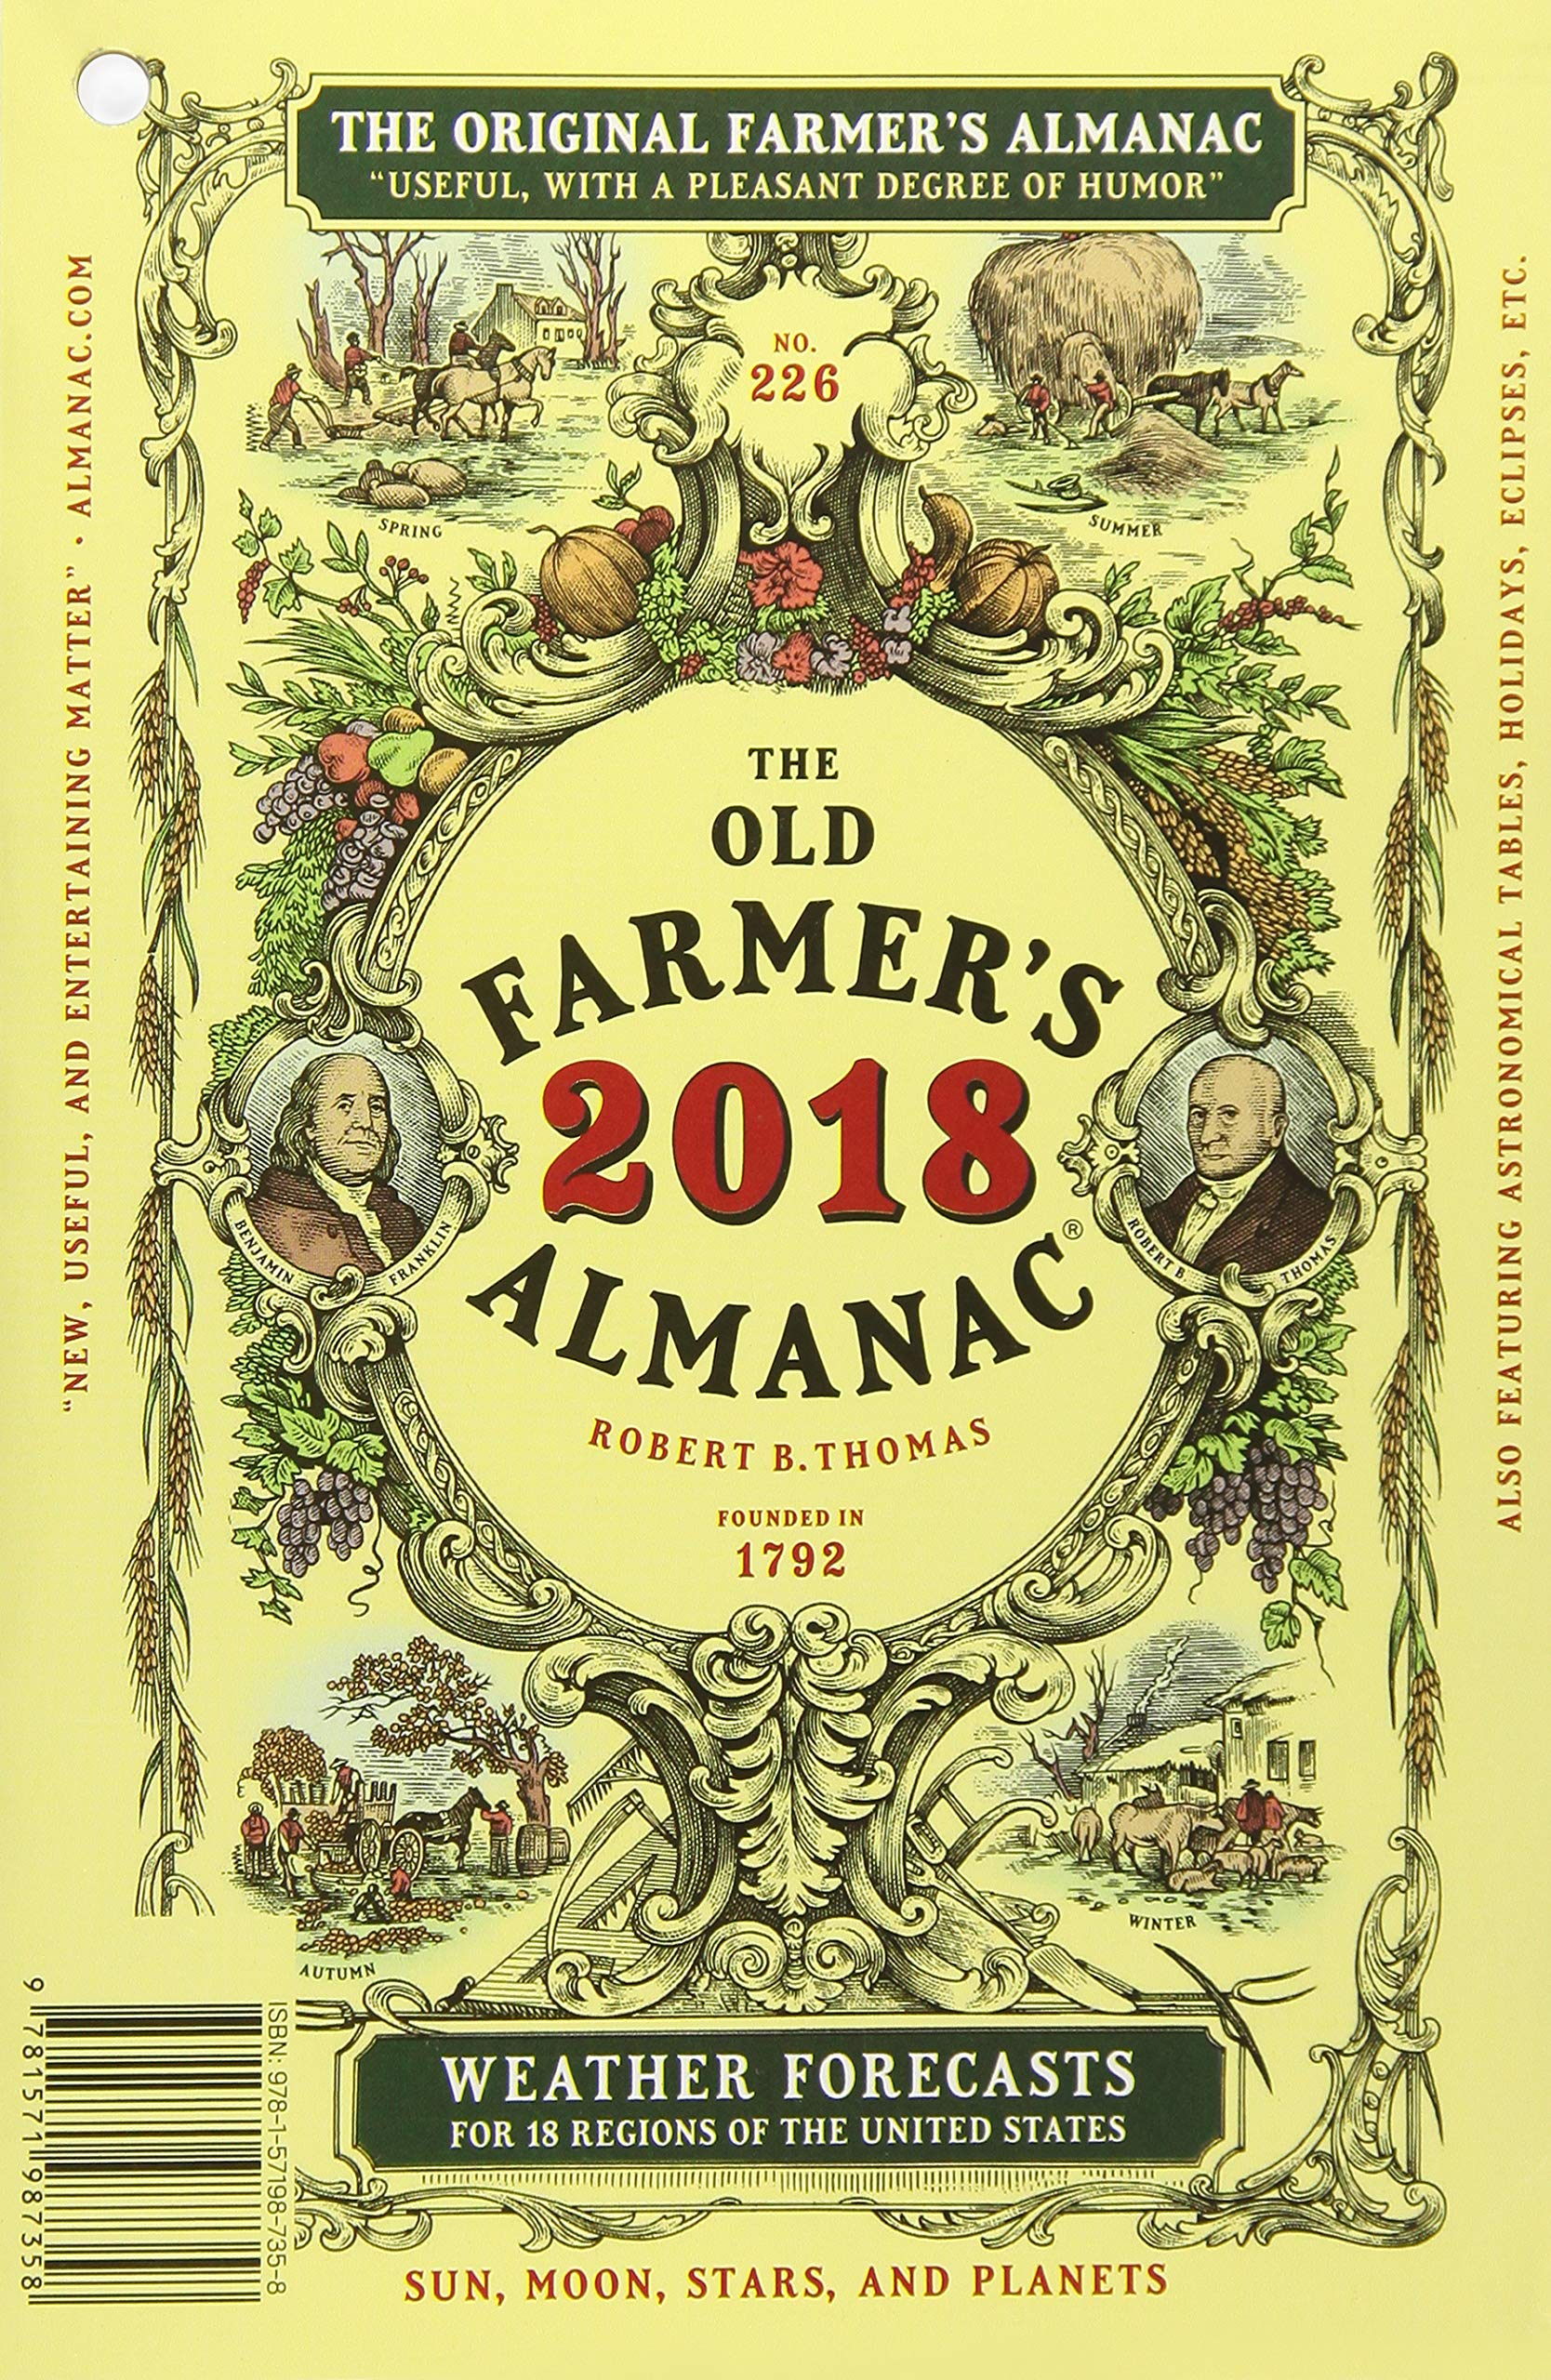 Amazon.com: The Old Farmer's Almanac 2018 (9781571987358): Old Farmer's  Almanac: Books